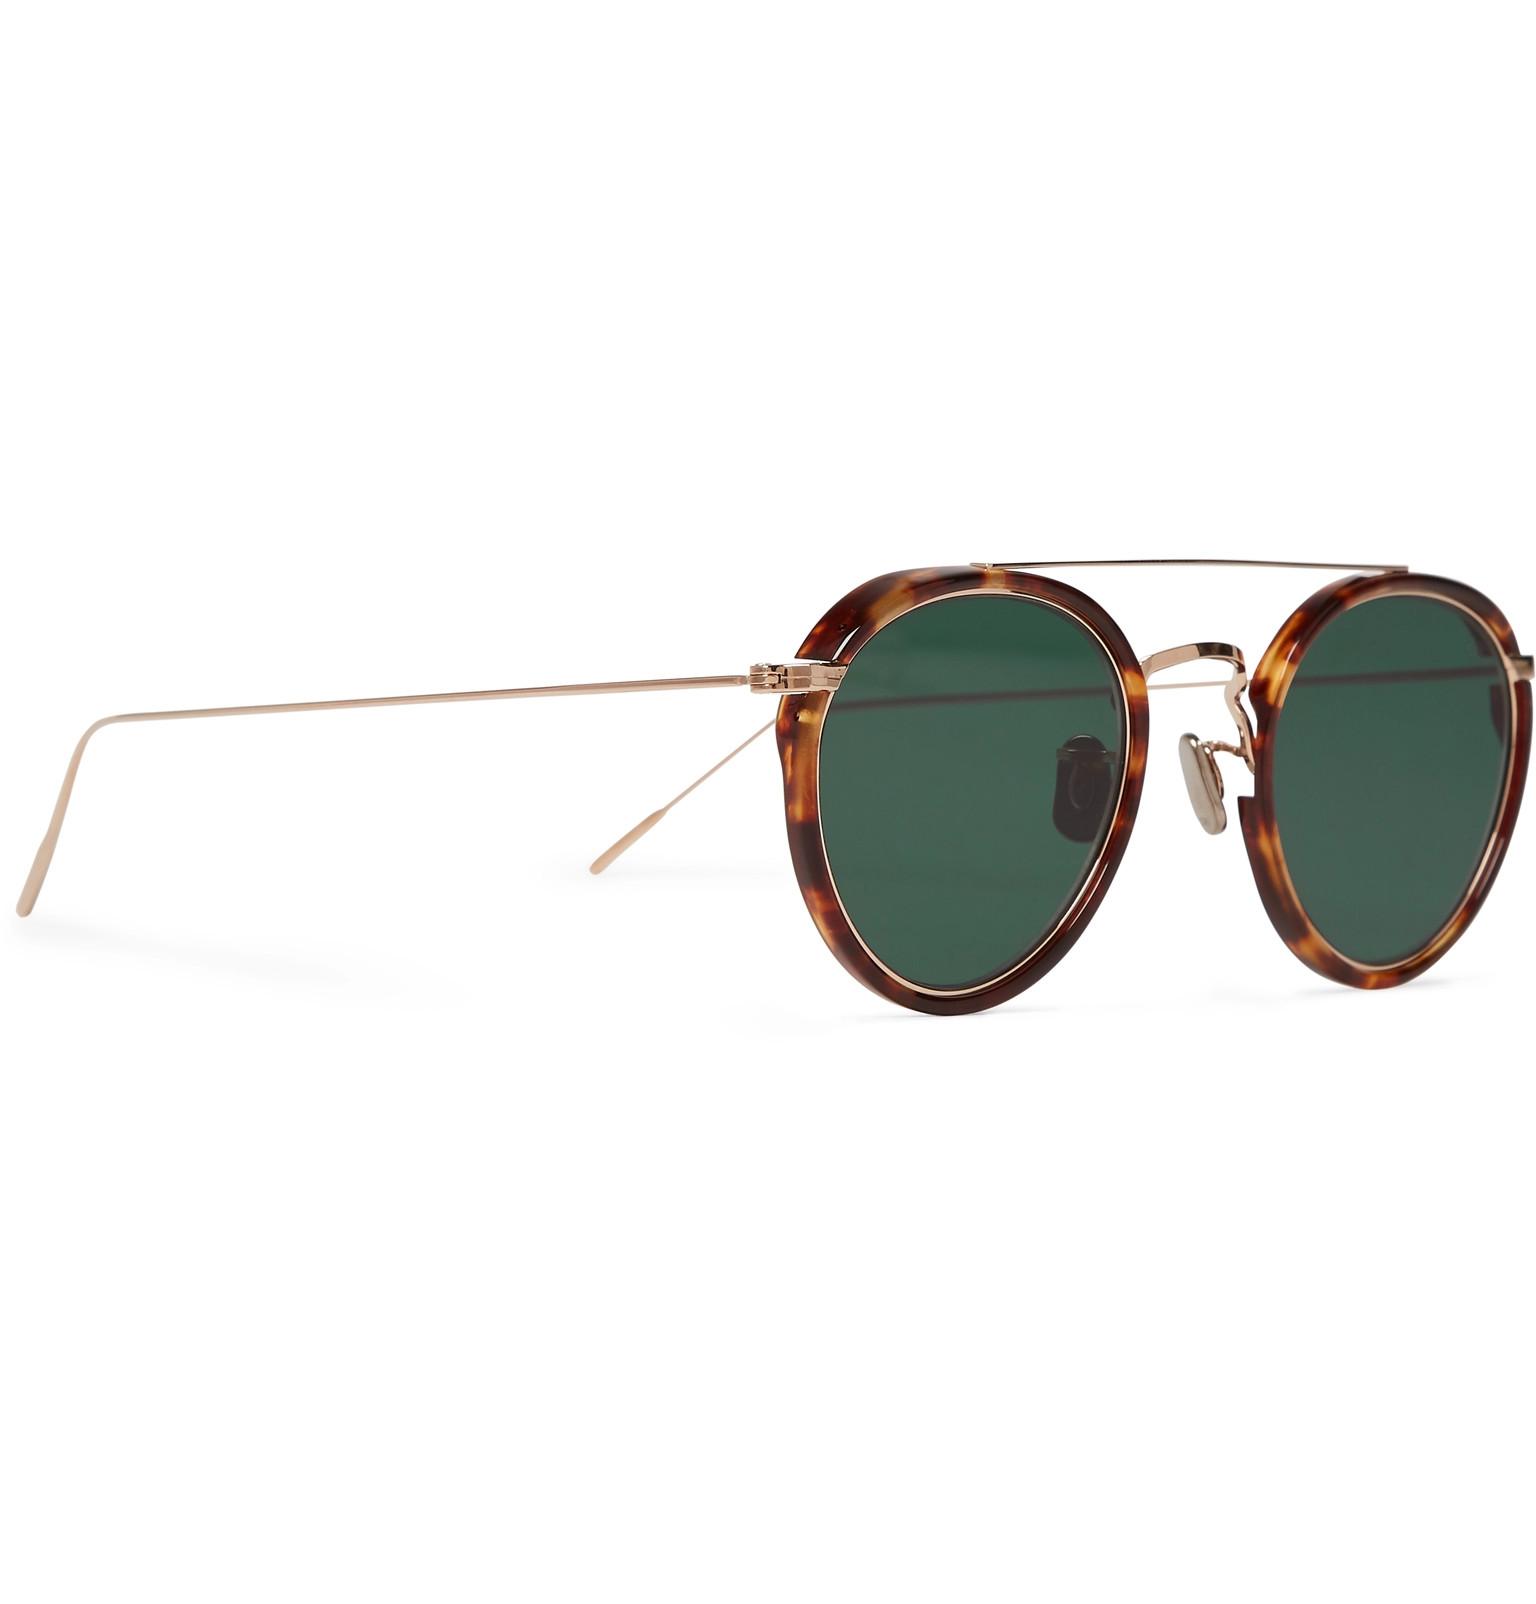 f8190ede89 Eyevan 7285 - Round-Frame Tortoiseshell Acetate and Gold-Tone Sunglasses